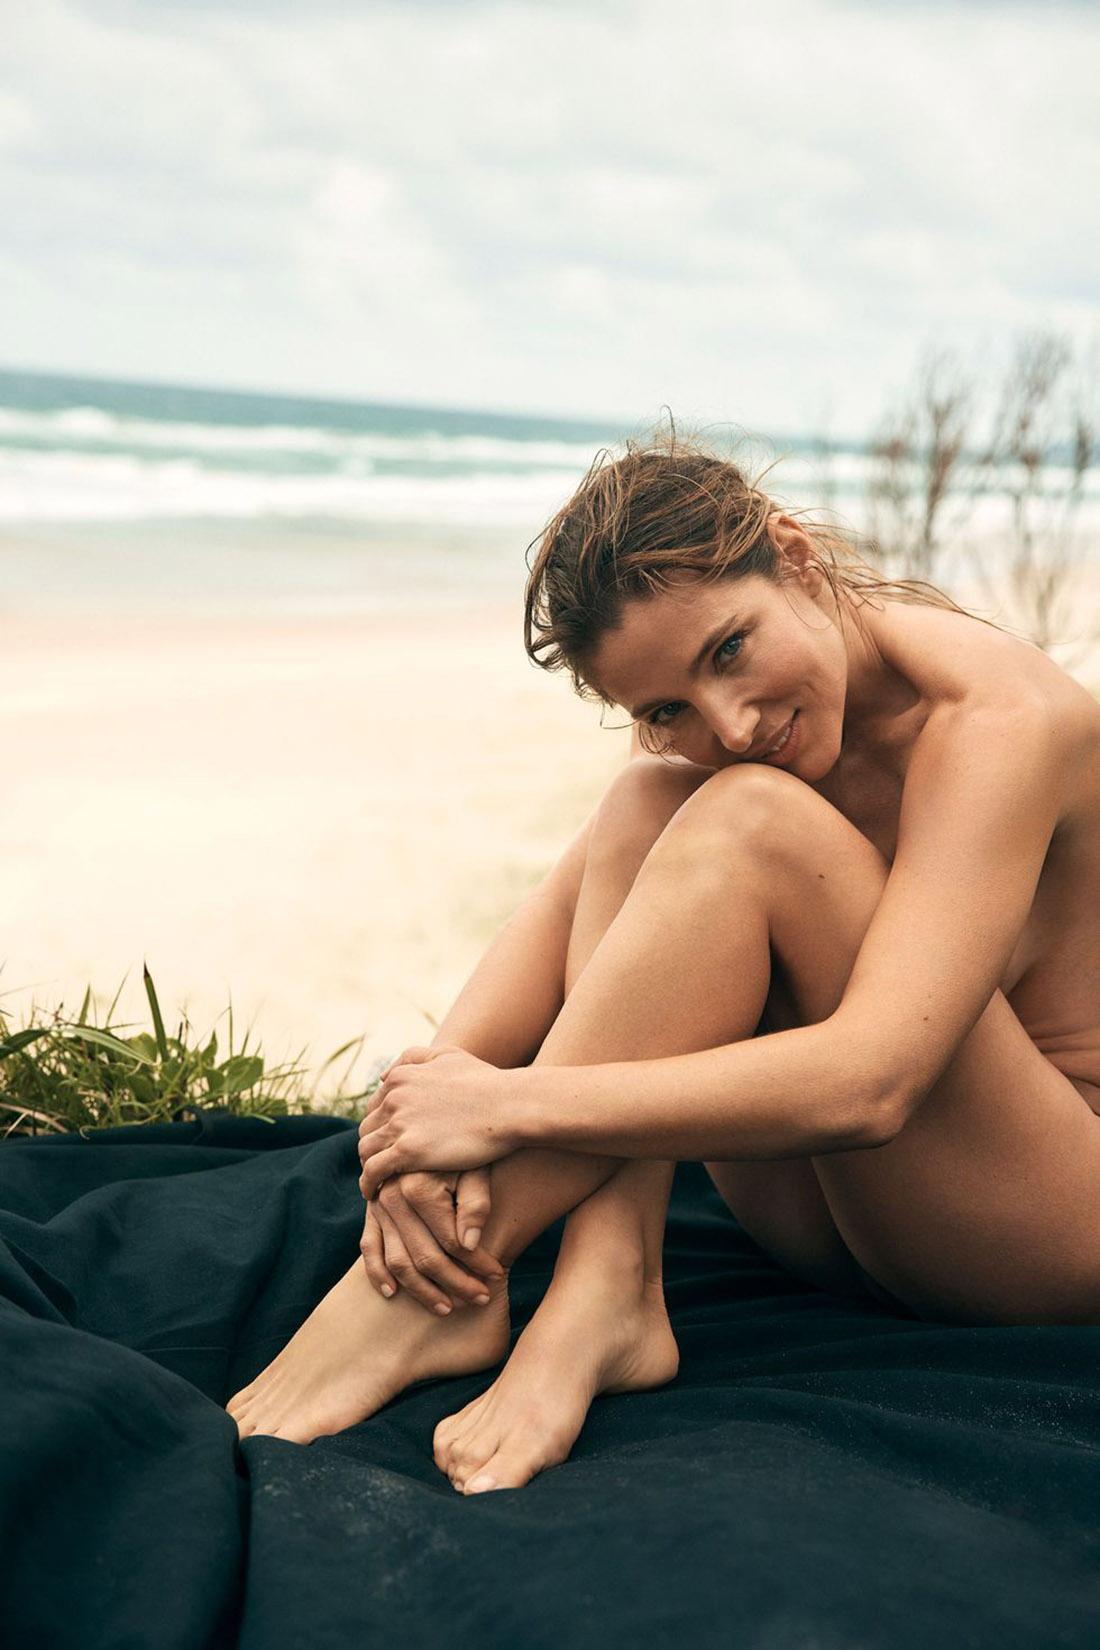 Elsa Pataky covers Elle Spain June 2021 by Darren McDonald